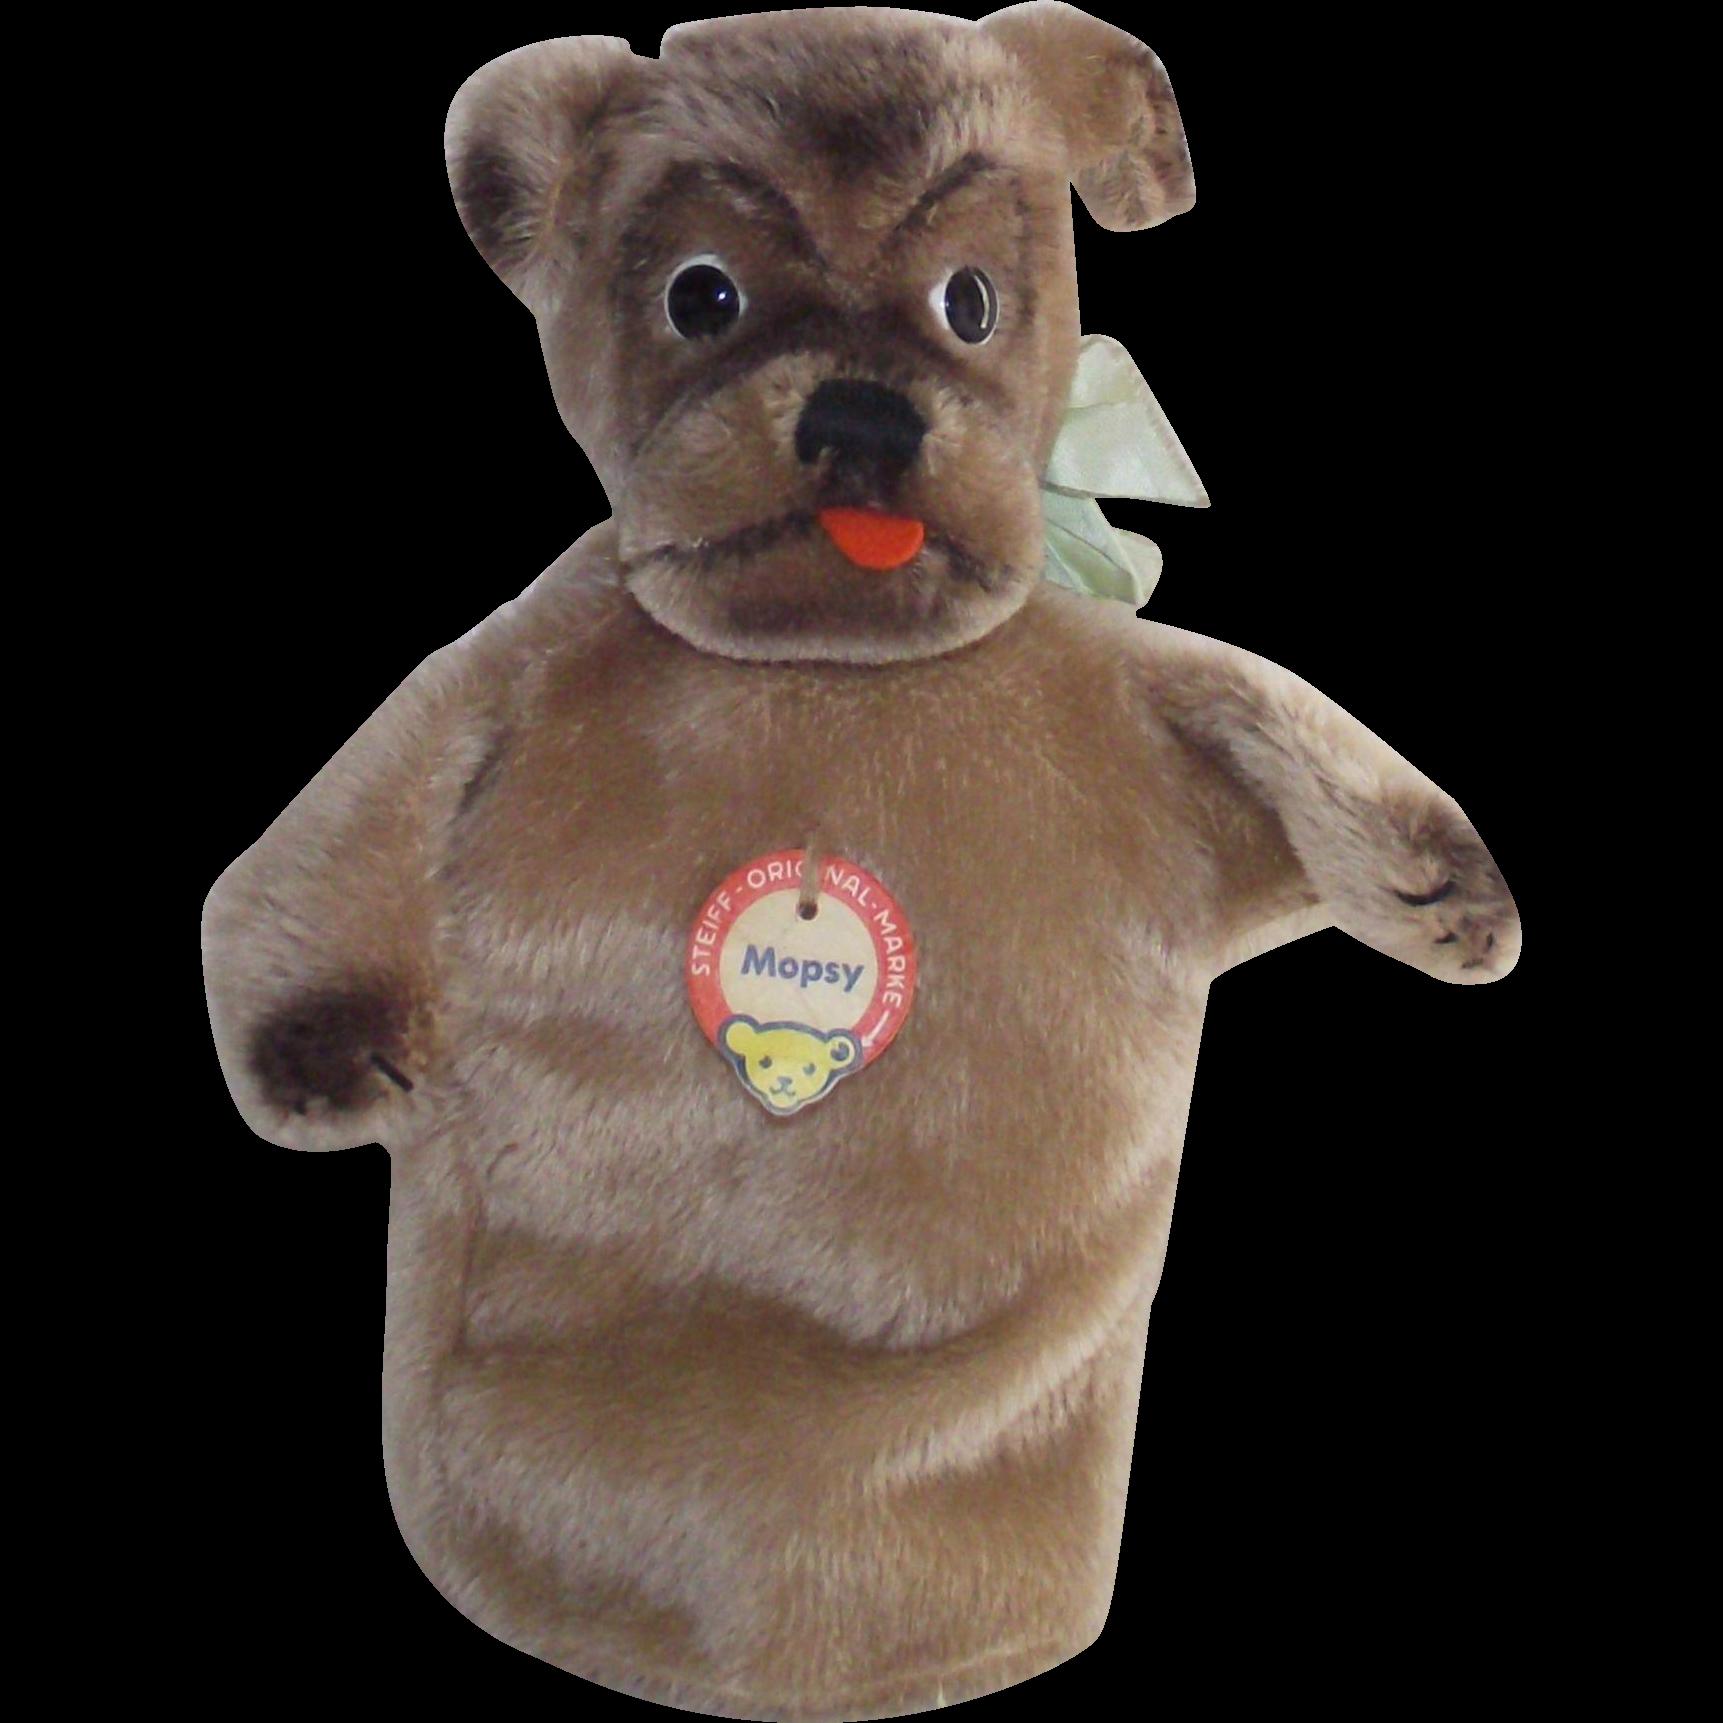 Steiff Mopsy Dog Mohair Plush Hand Glove Puppet